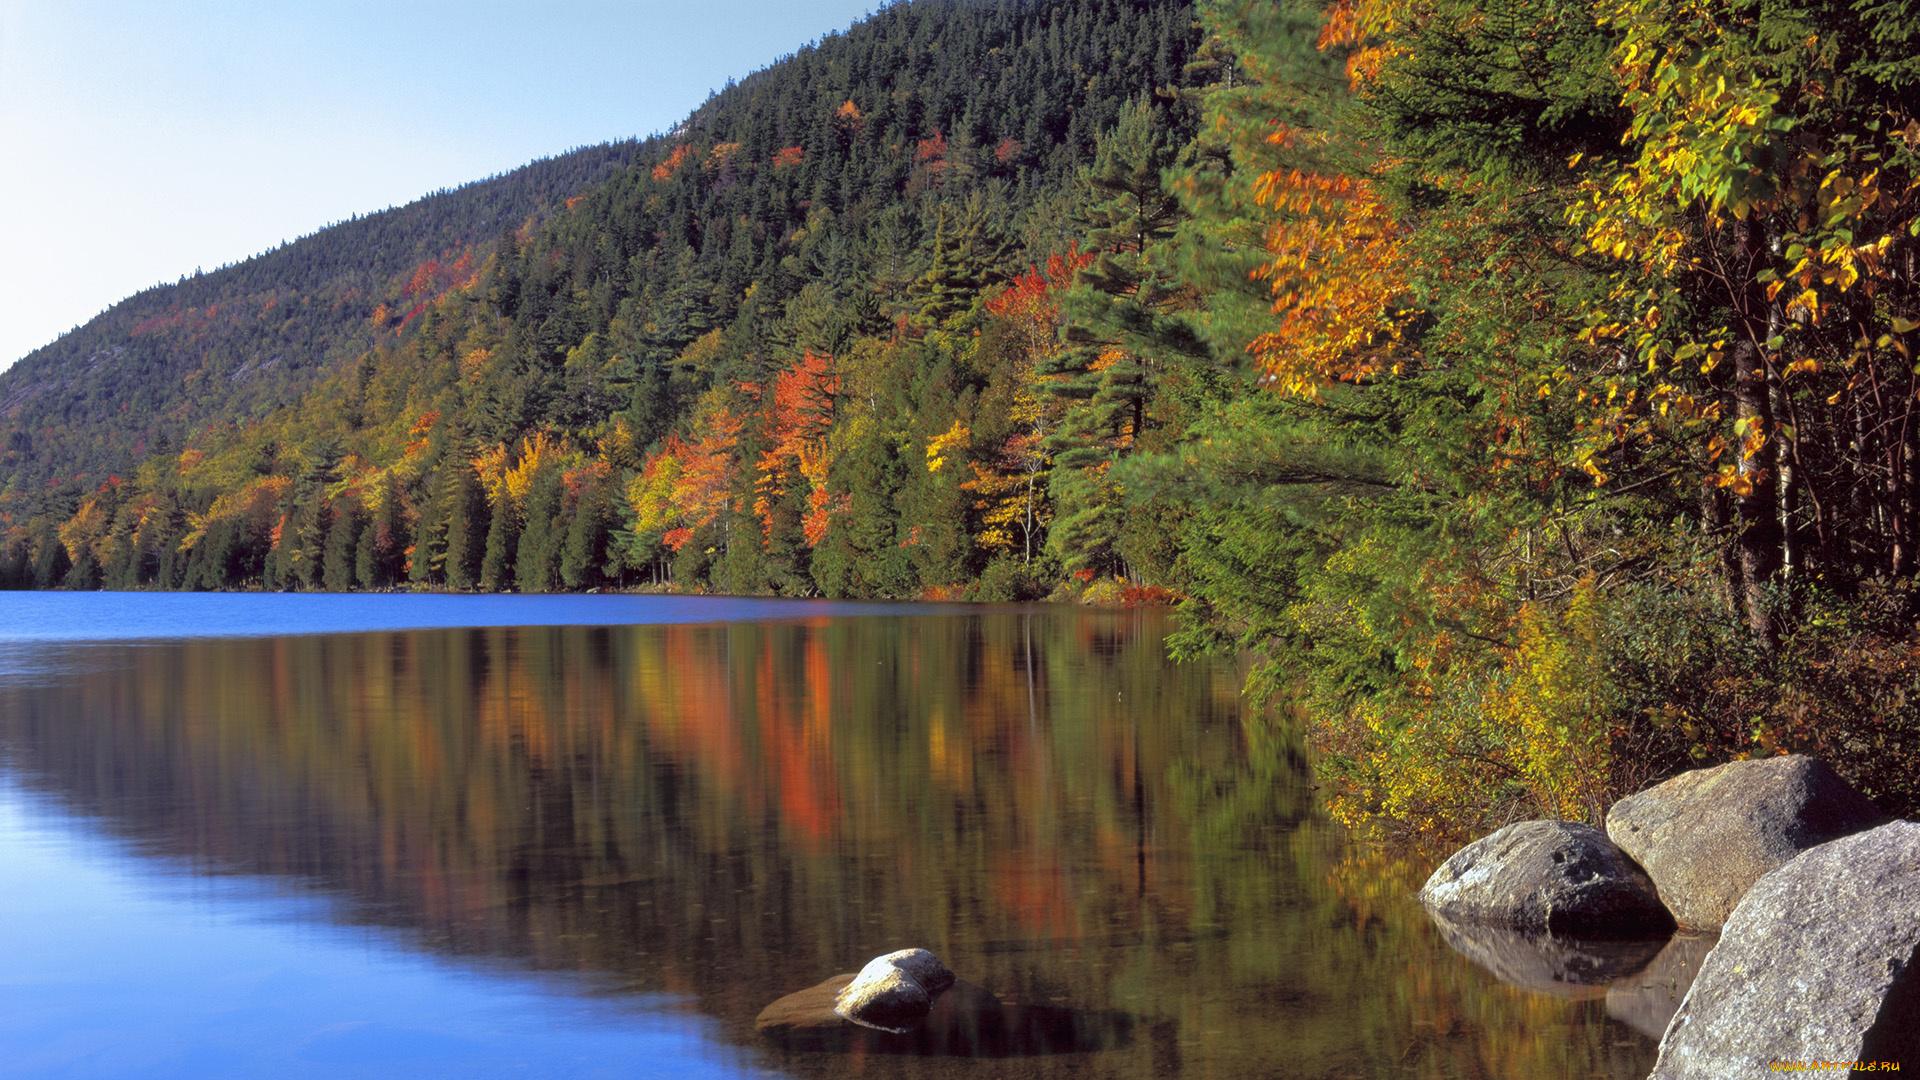 обои на рабочий стол осень природа река озеро лес № 241691 без смс